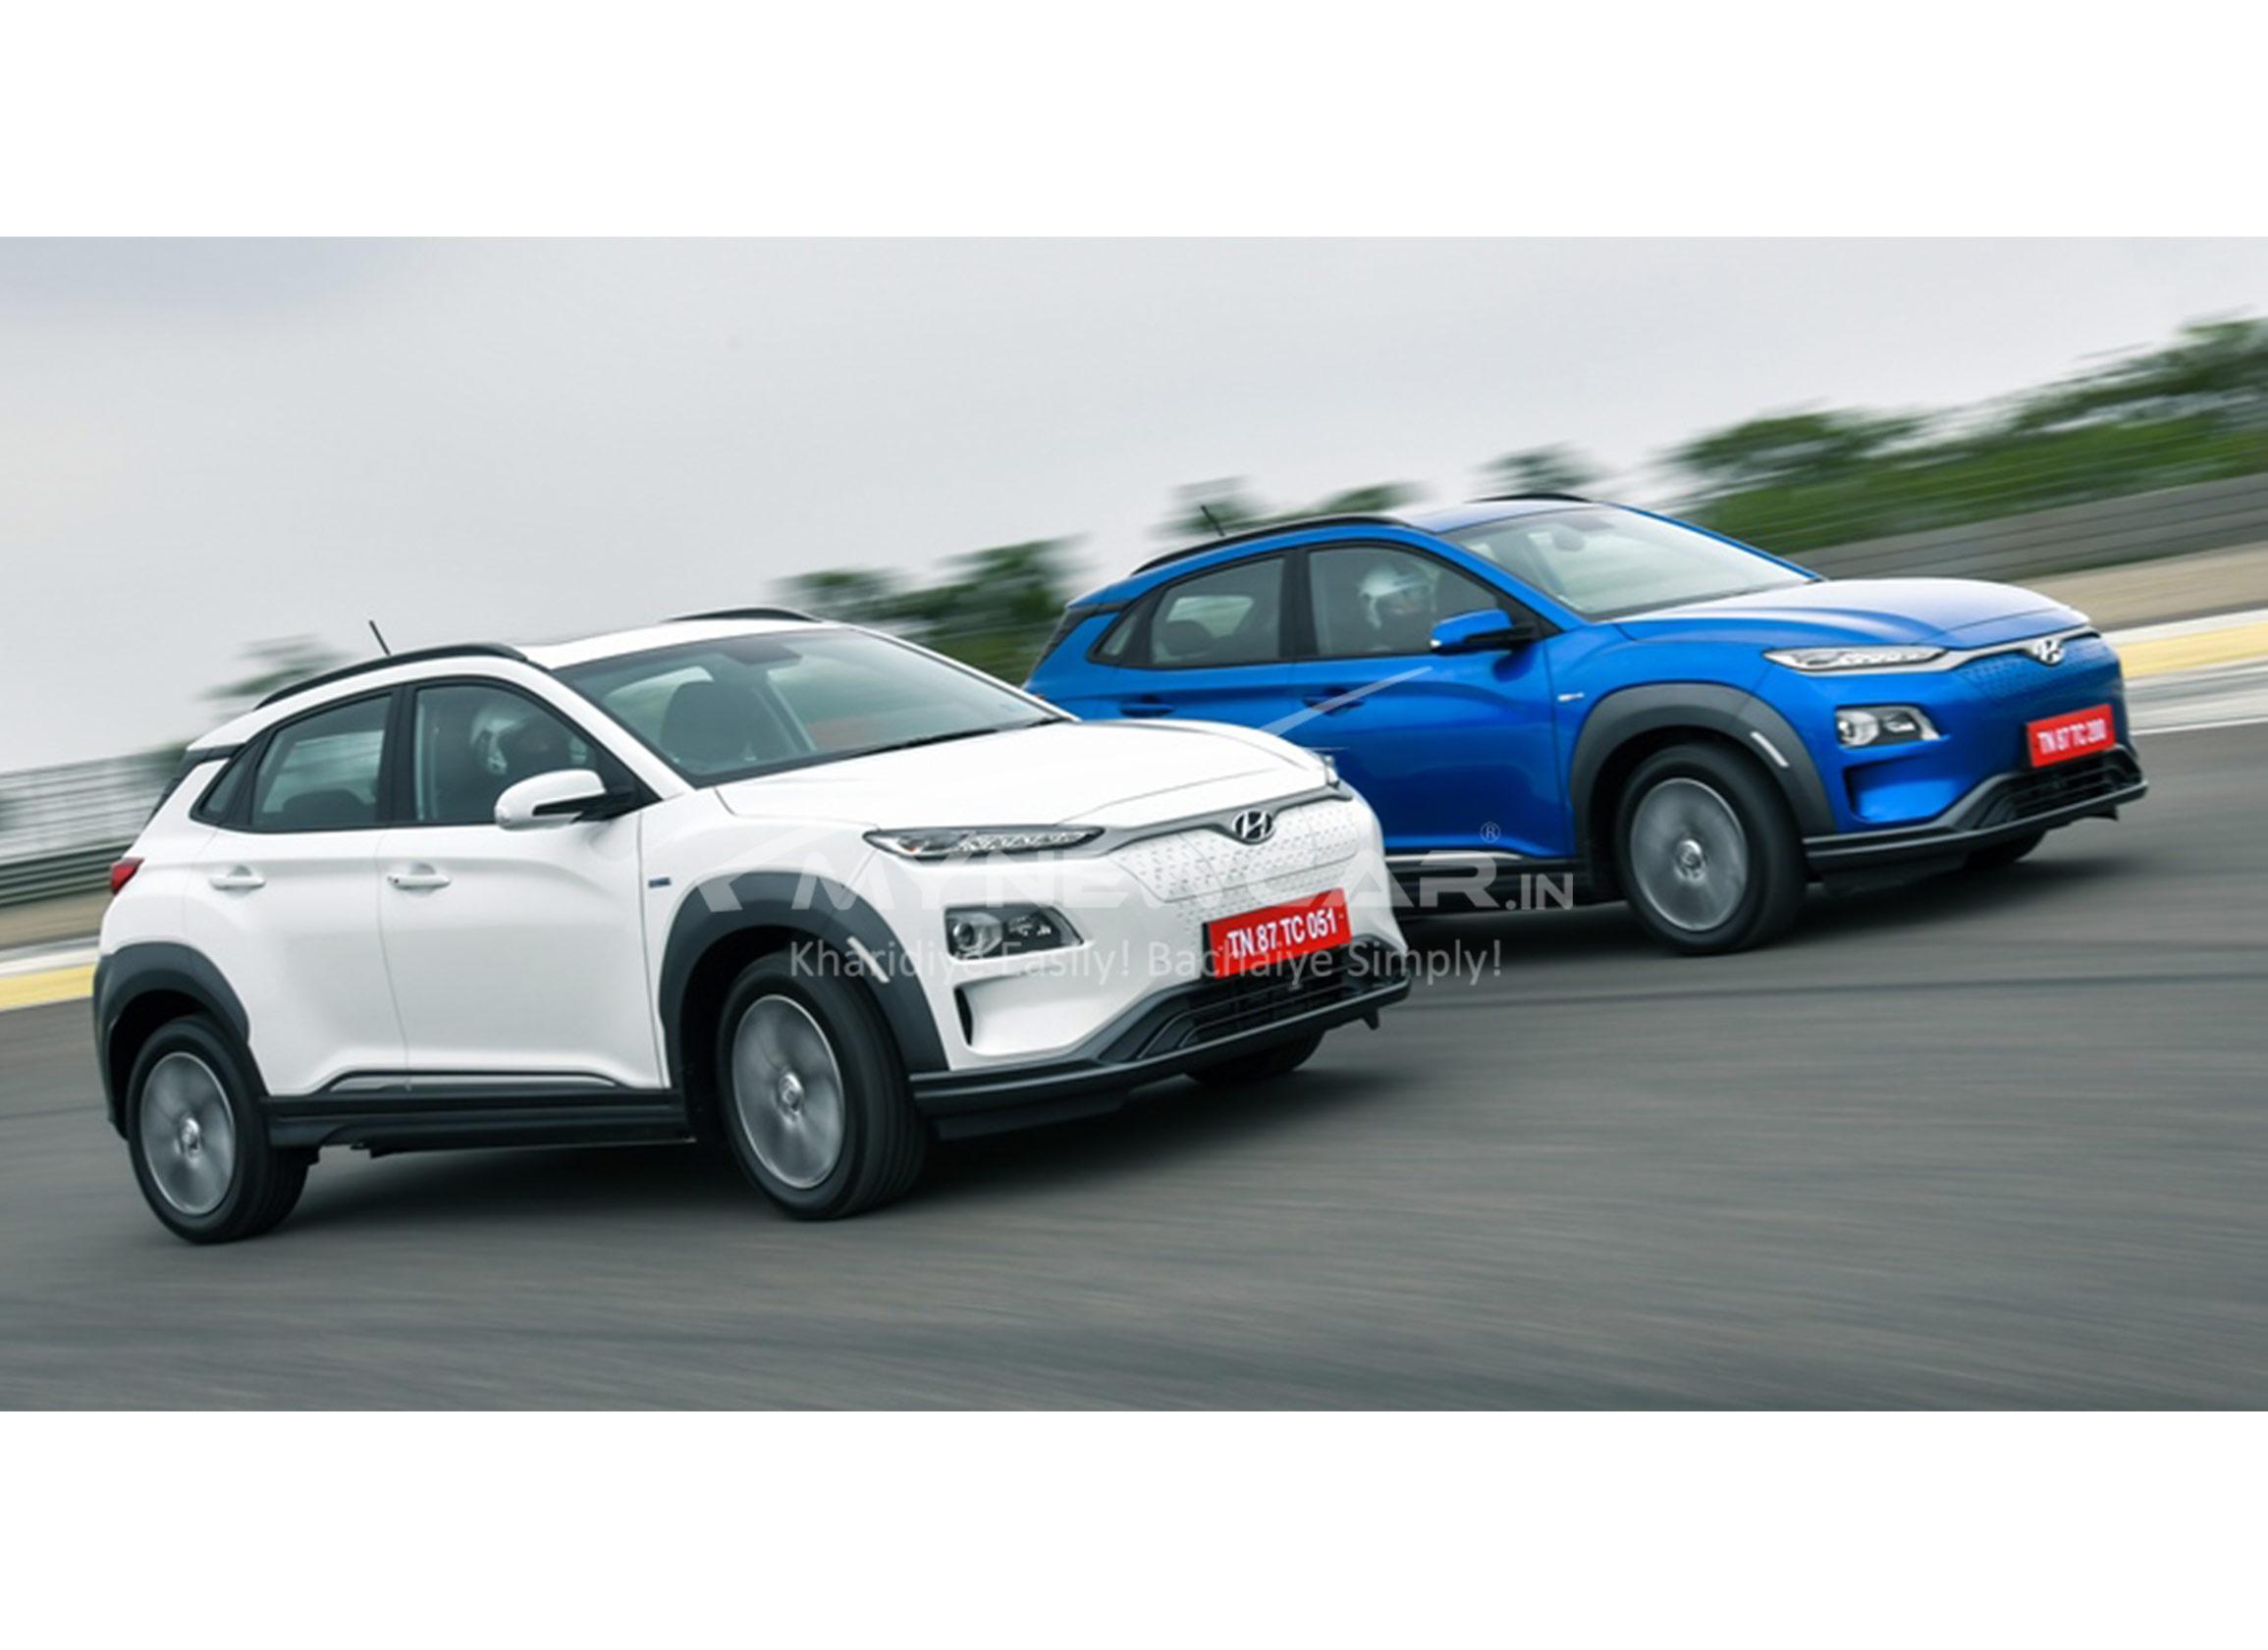 hyundai kona electric car image